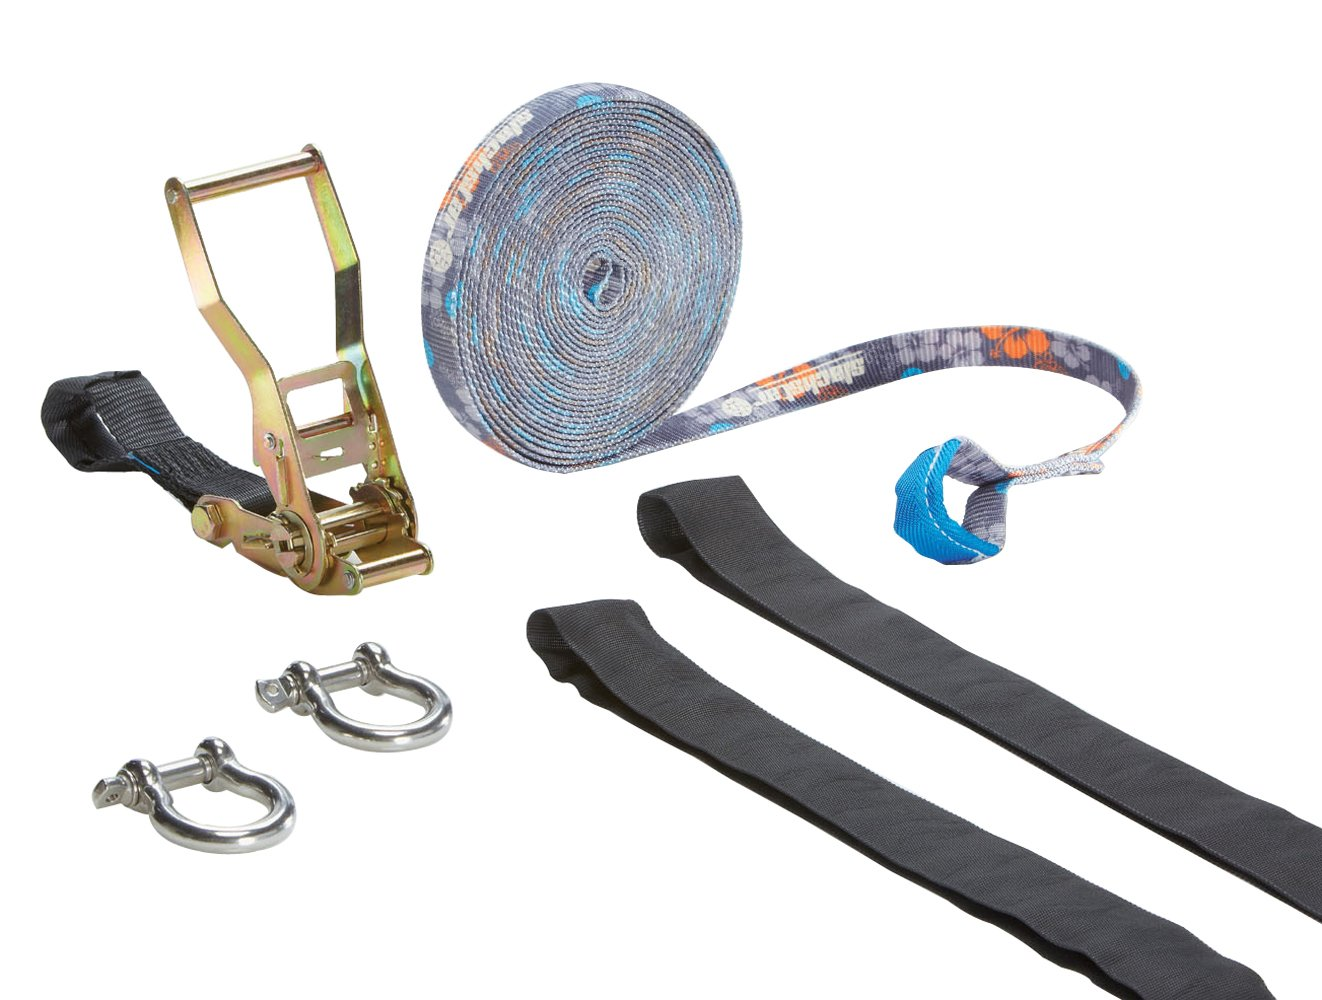 Slackstar Slackline-Set, 10 m lang, 2,5 cm breit